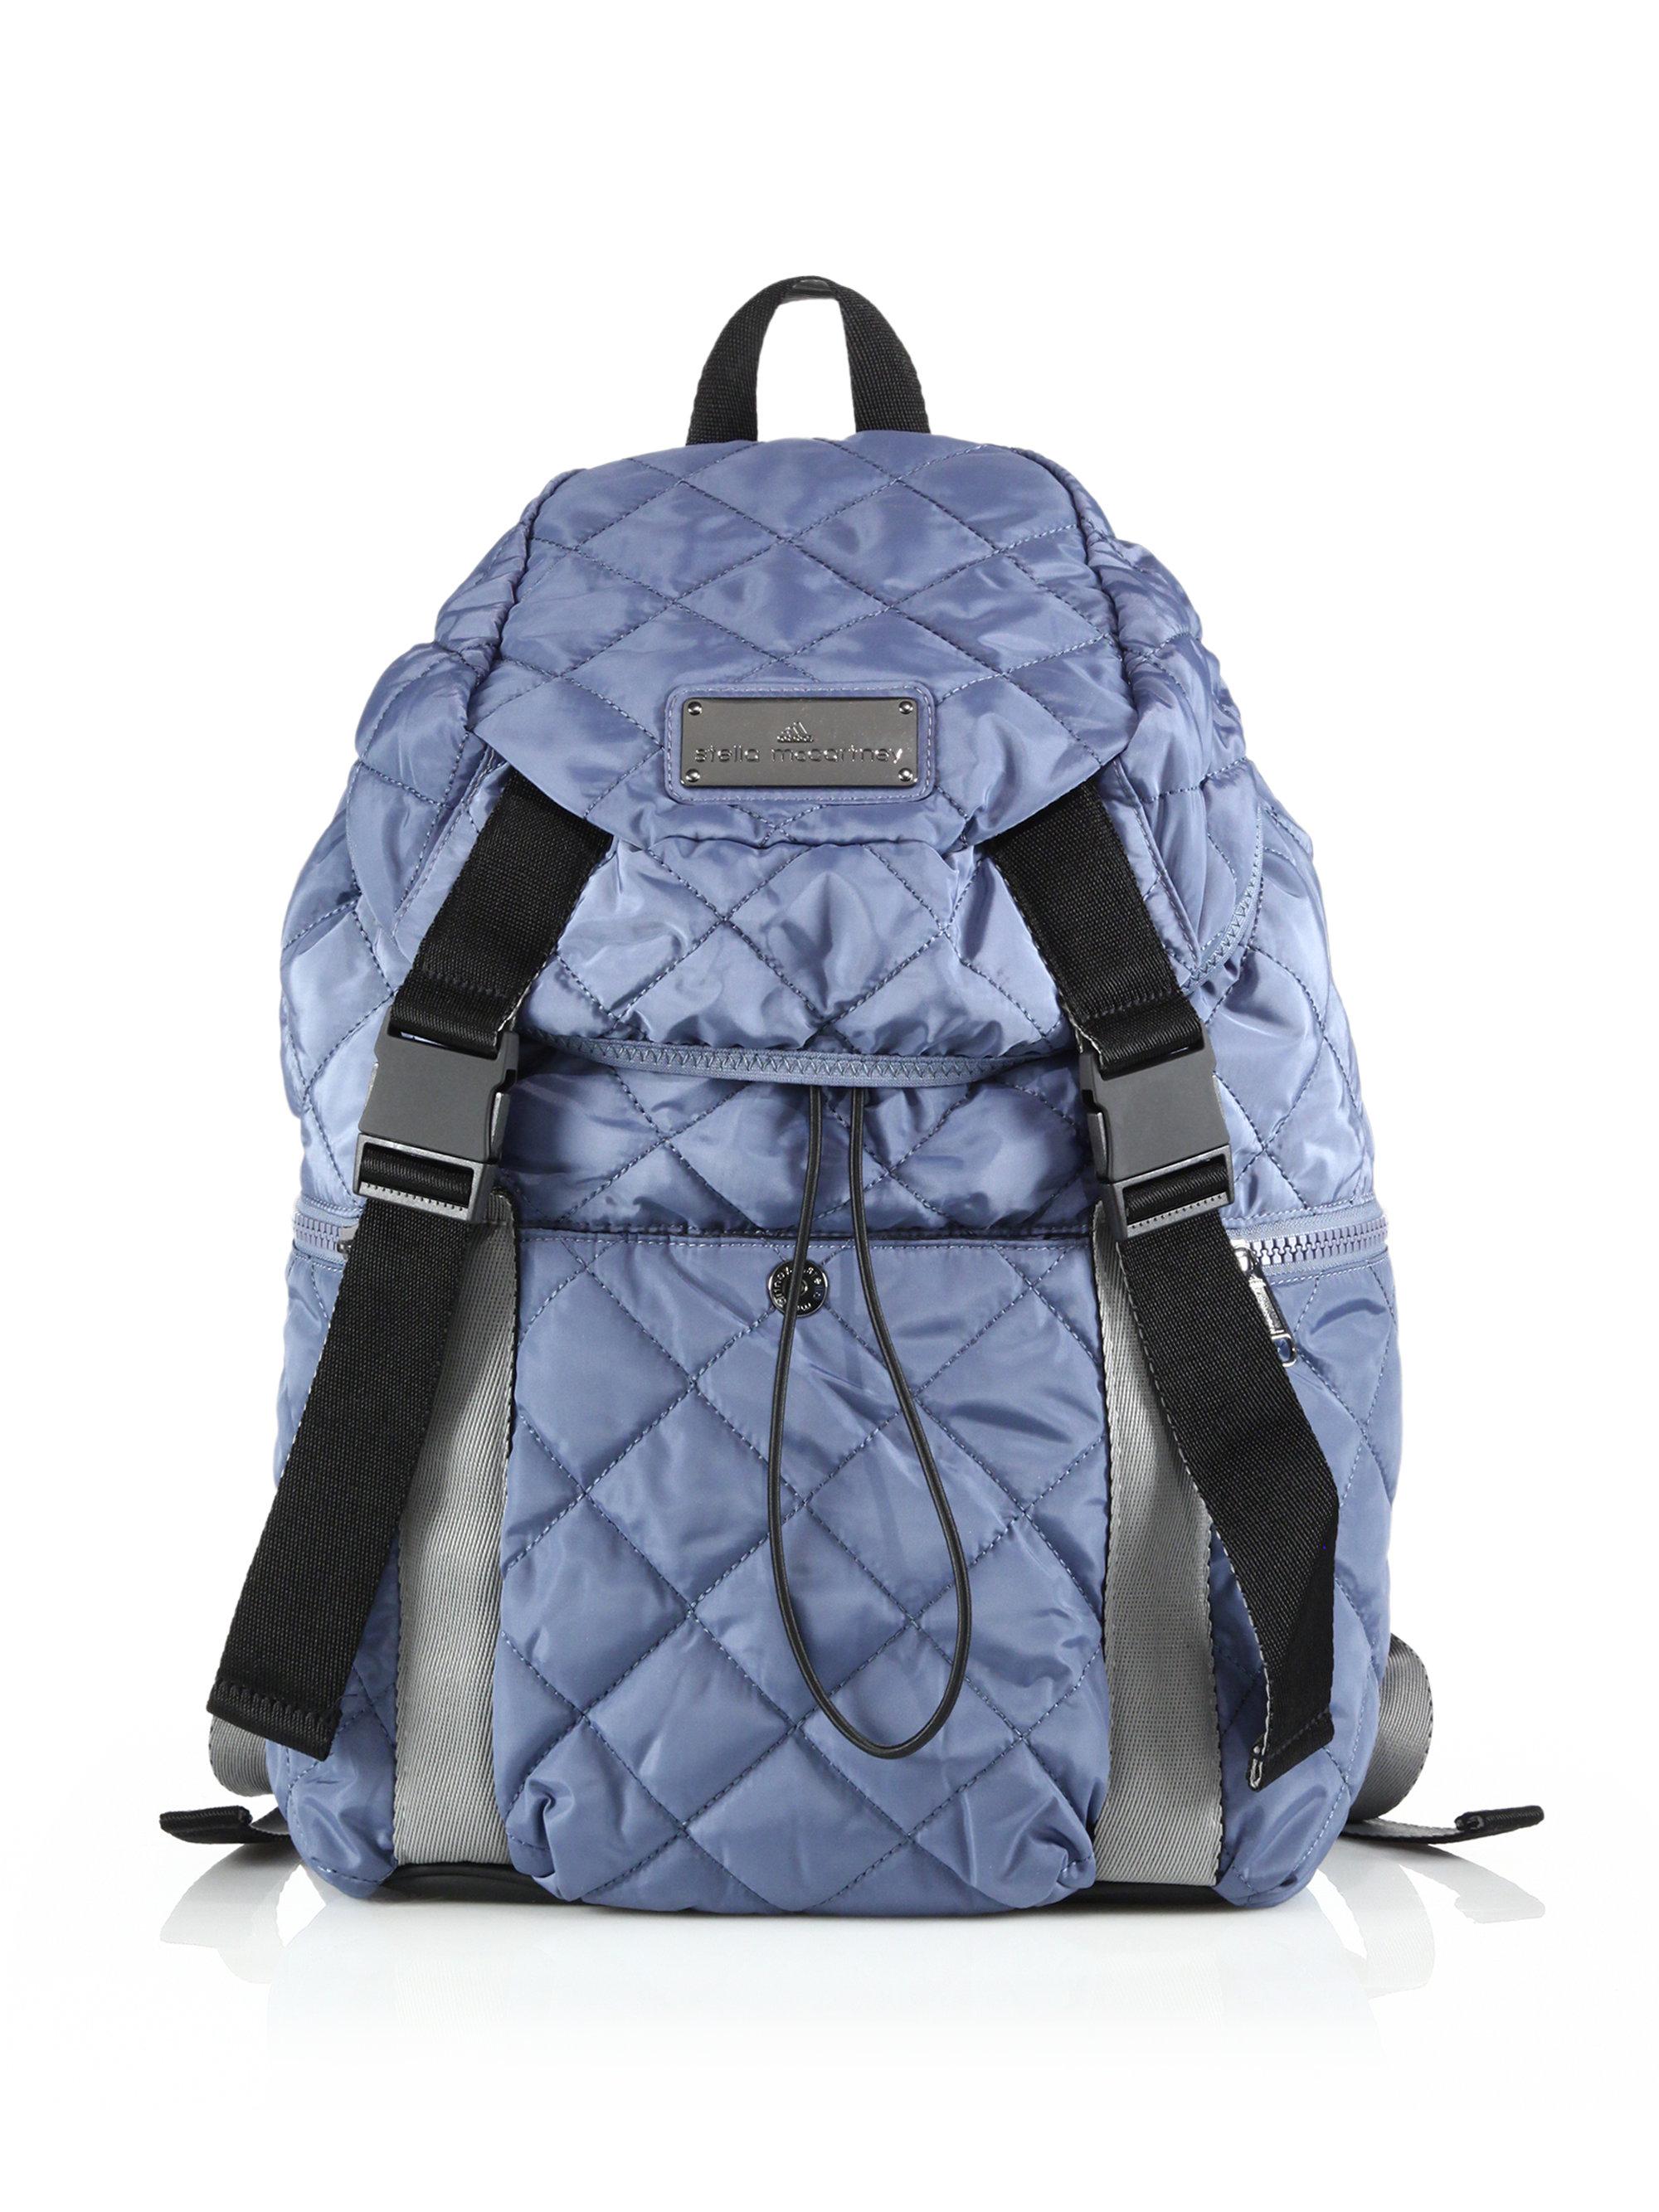 lyst adidas by stella mccartney quilted weekender backpack in blue. Black Bedroom Furniture Sets. Home Design Ideas